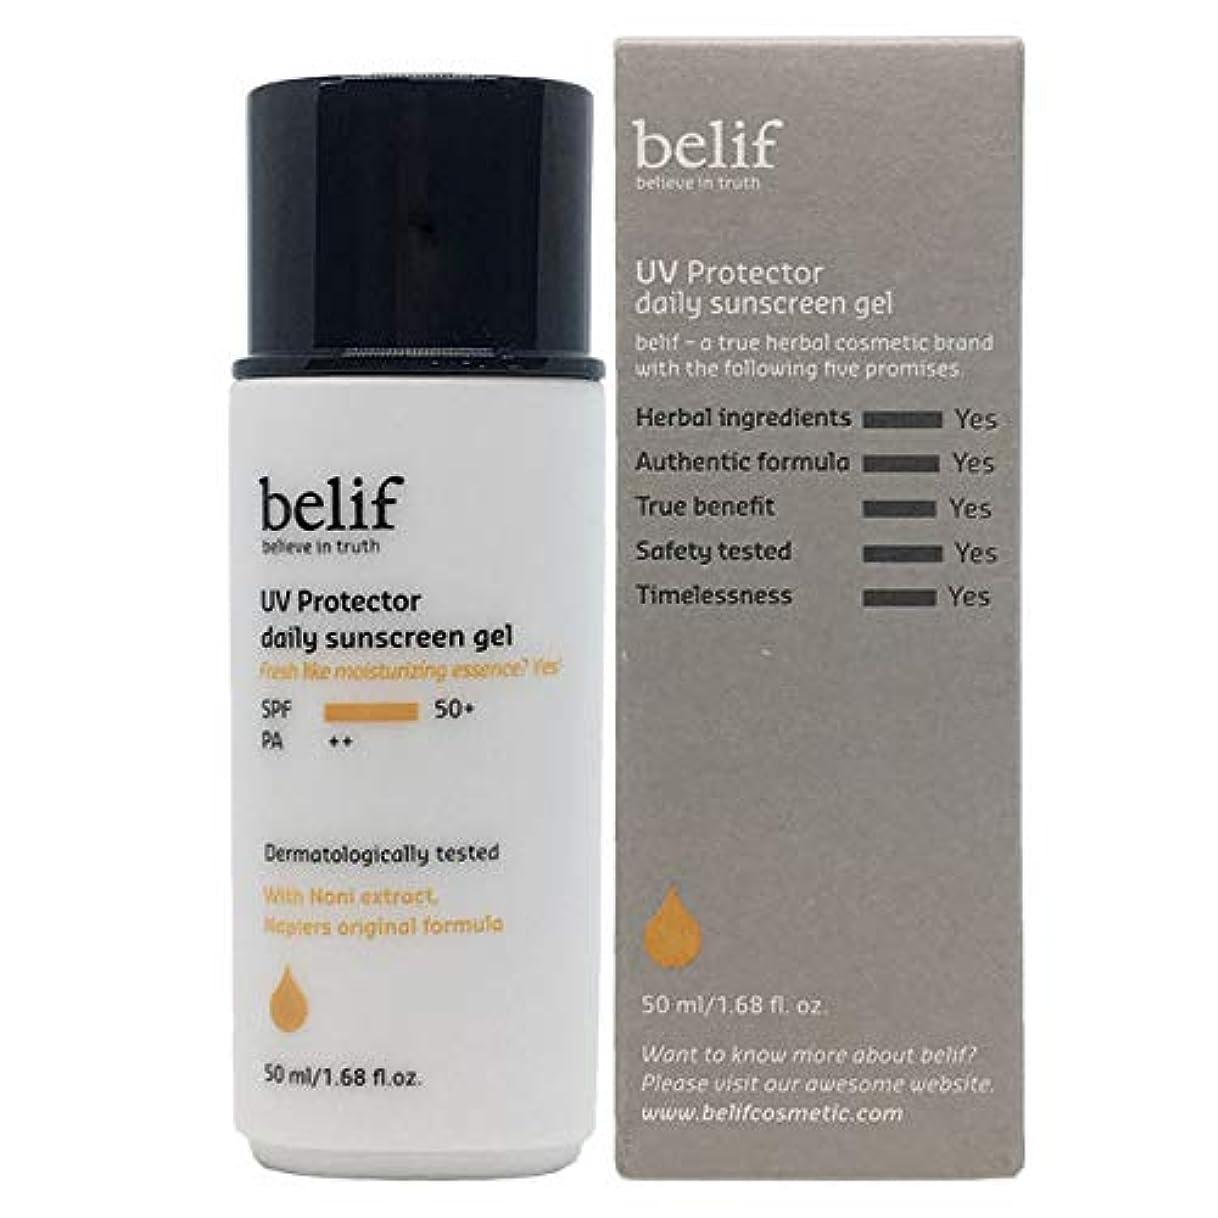 Belif(ビリーフ)UV Protector Daily Sunscreen Gel 50ml/ビリーフUVプロテクター サンスクリーン ジェル